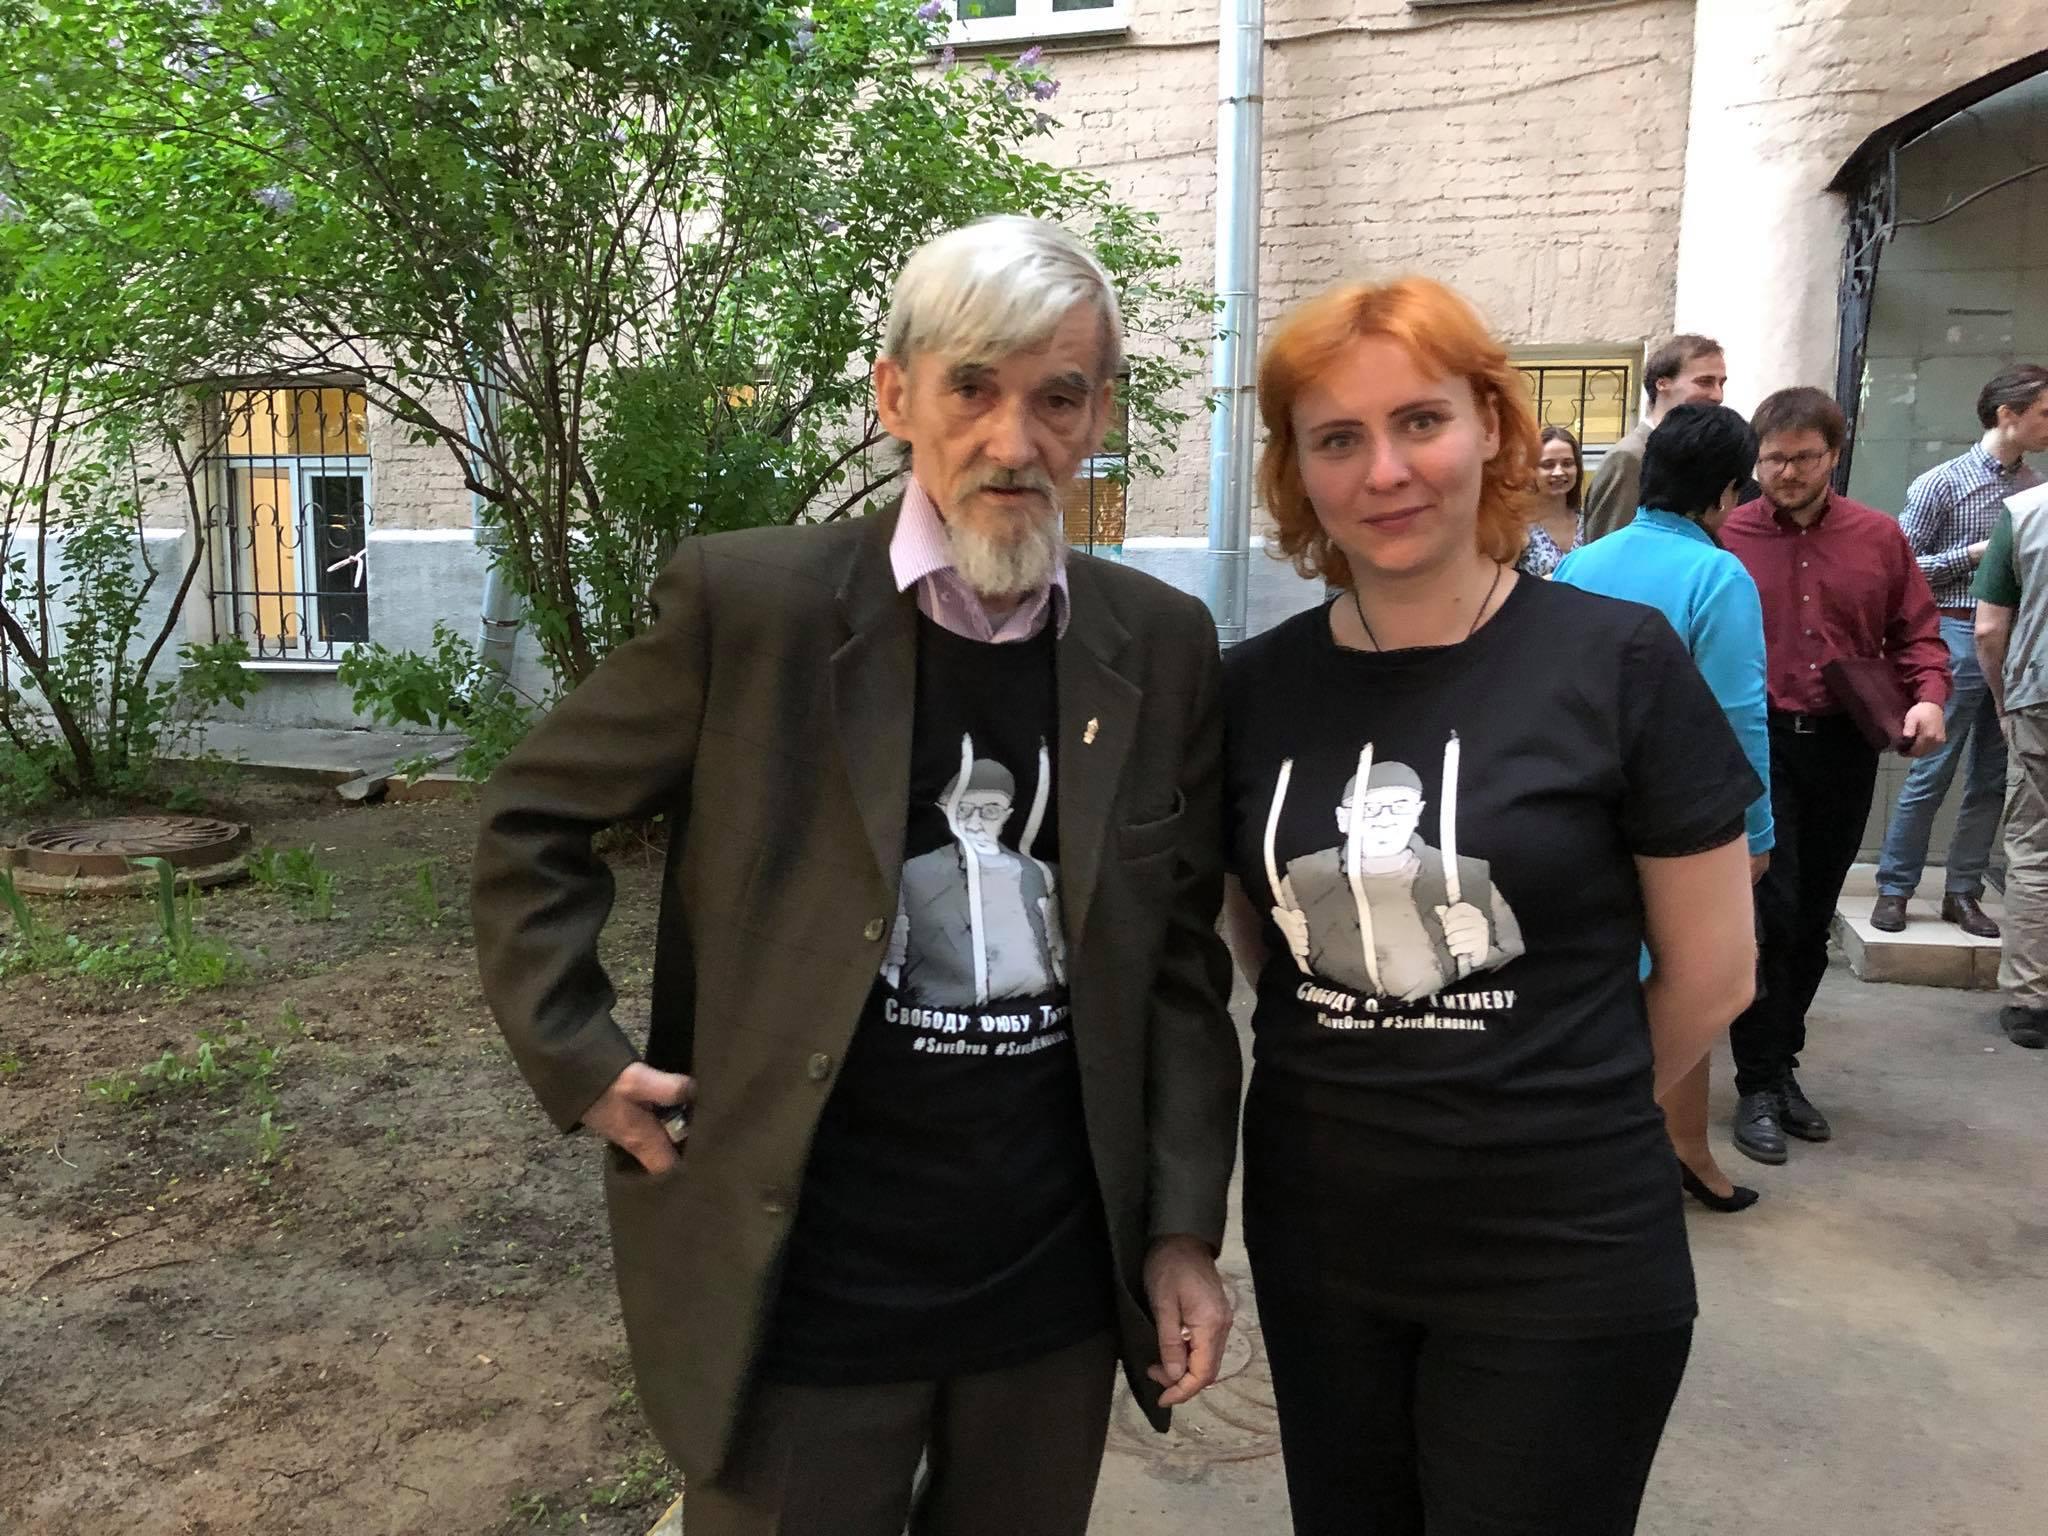 Dmitriev in Titiyev teeshirt after MHG award